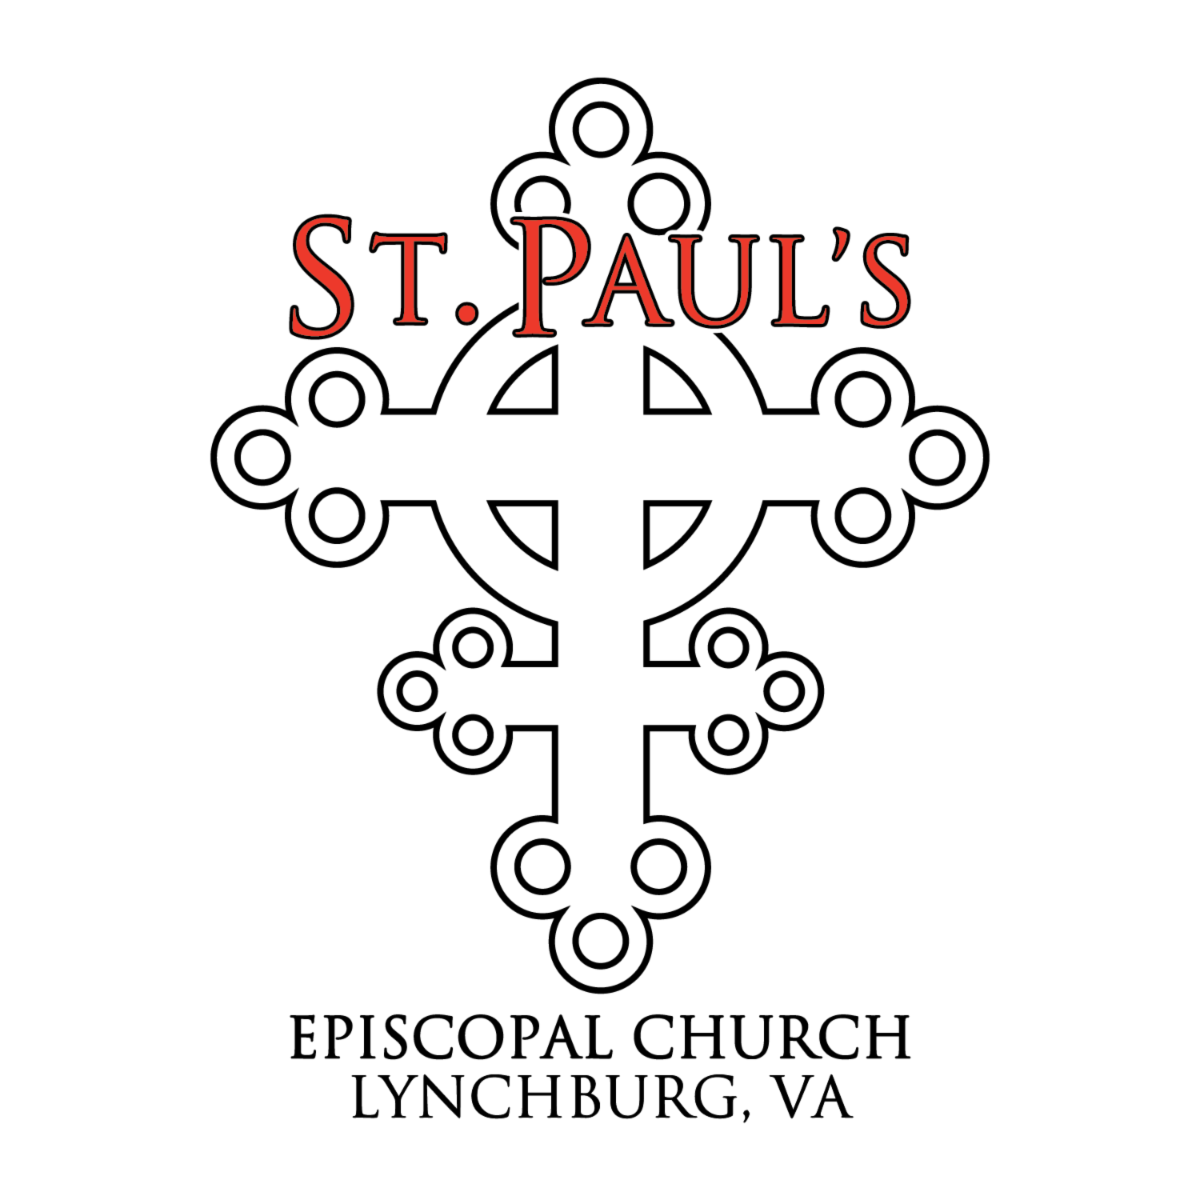 stpauls_logo-01.png